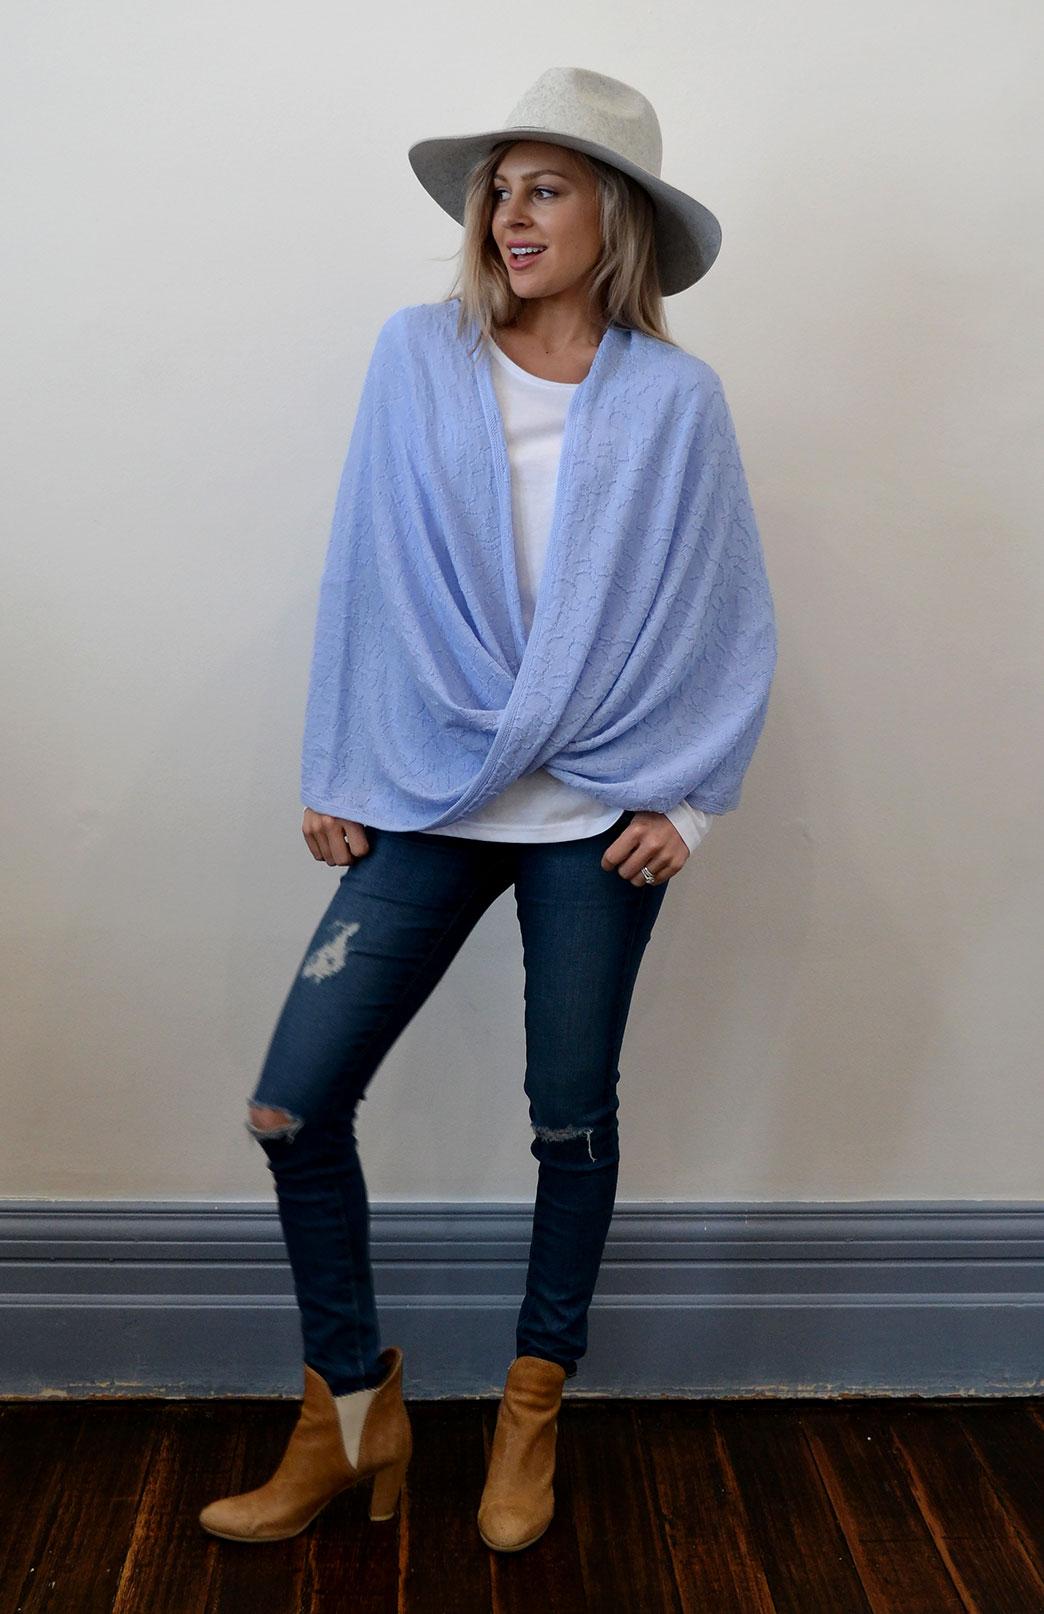 Merino Twisted Wrap - Women's Merino Wool Pale Blue Twisted Wrap and Classic Shrug - Smitten Merino Tasmania Australia